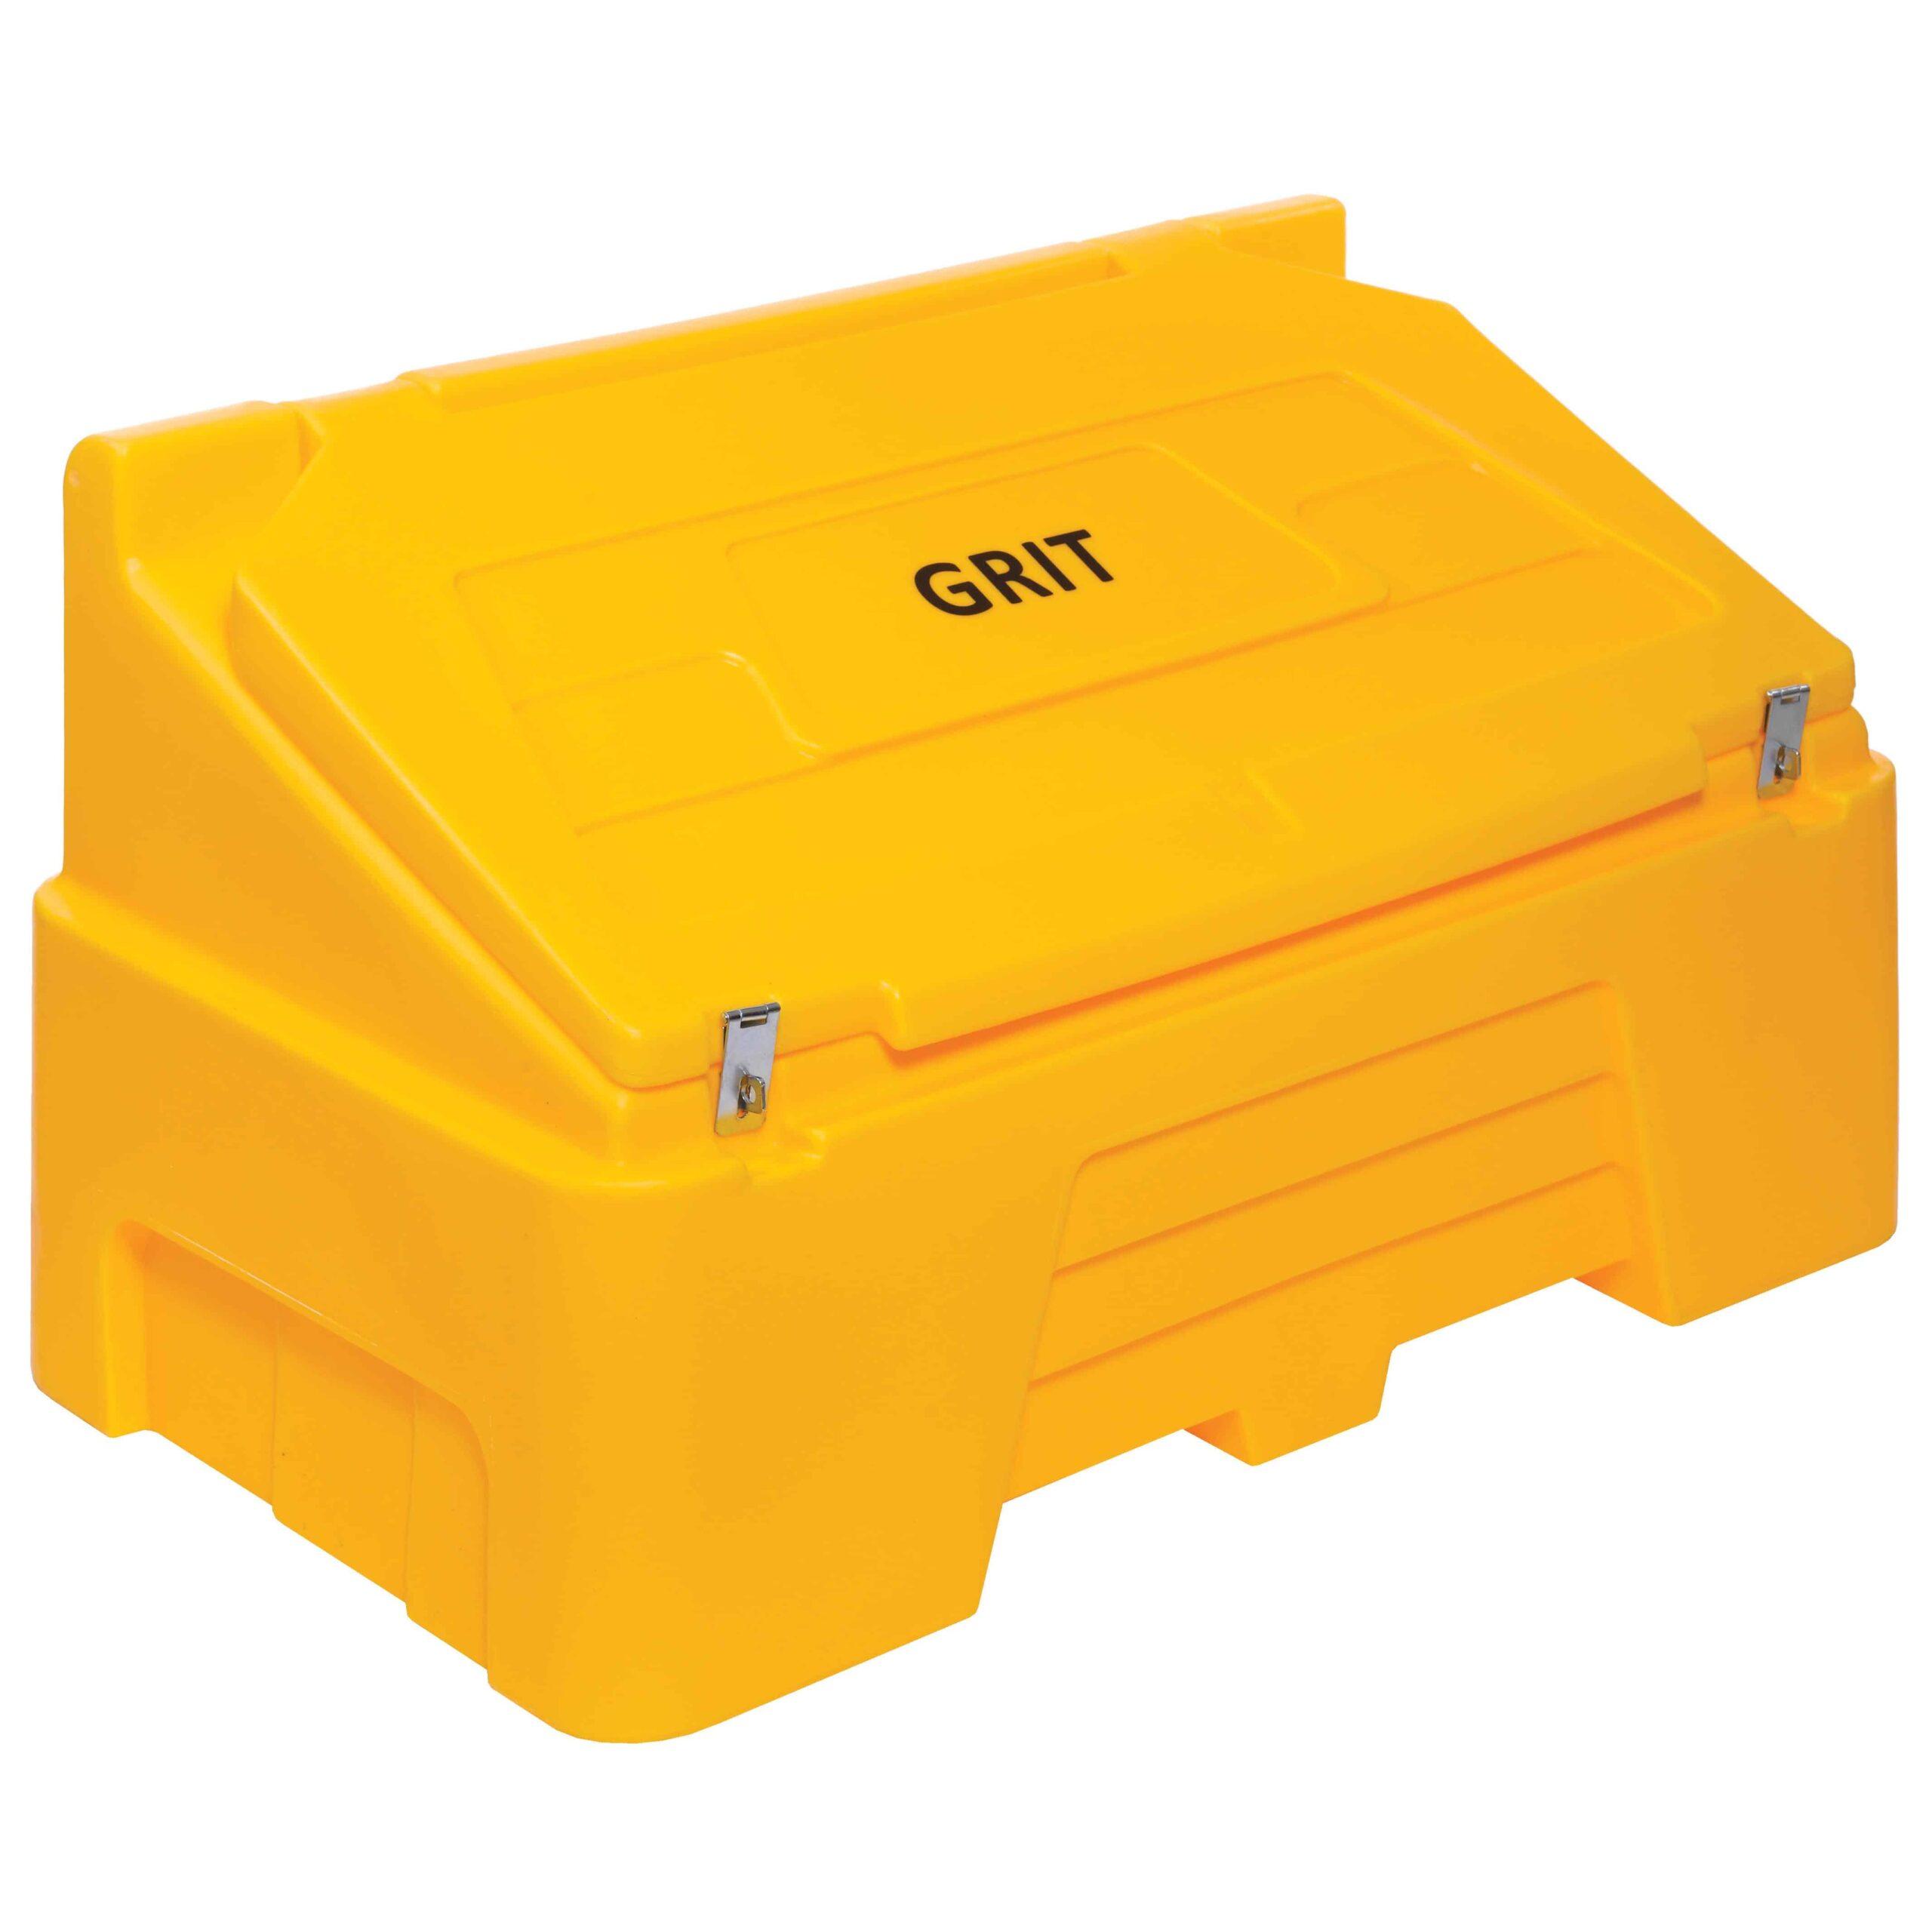 400 Litre Premium Heavy Duty Plastic Grit Bins